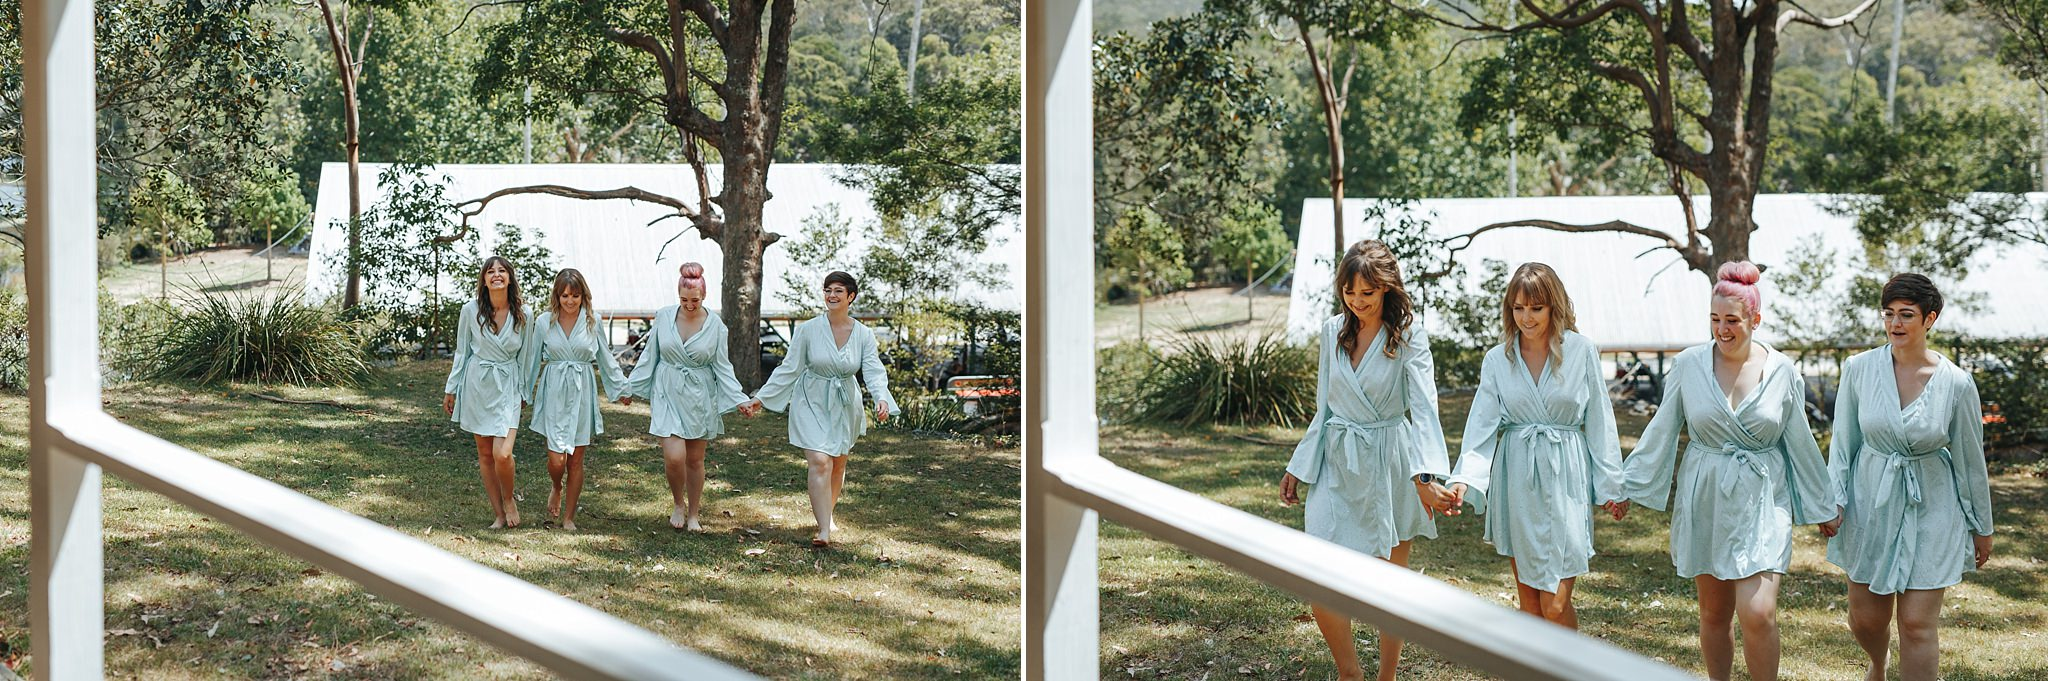 royal-national-park-wedding-blog-aaronsami-79.jpg